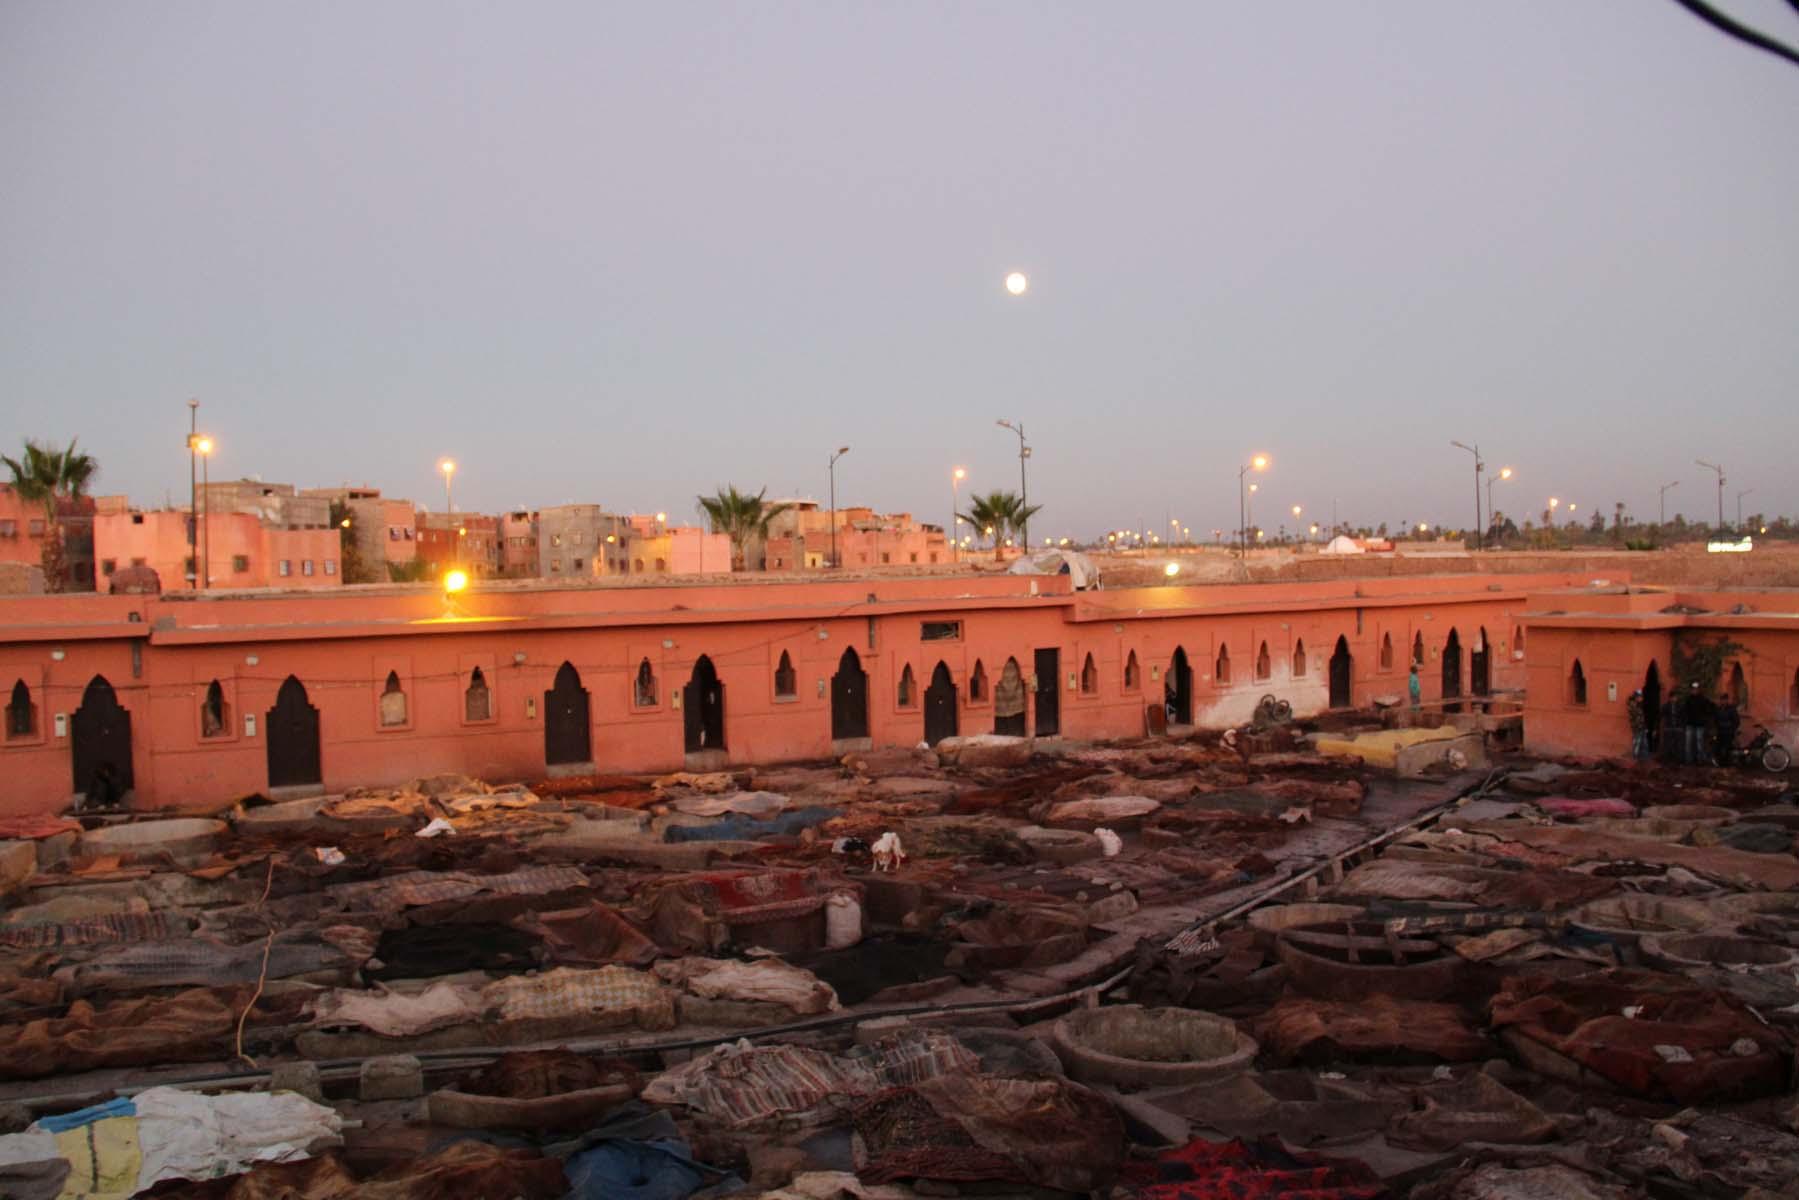 Vista di una conceria a Marrakech al tramonto